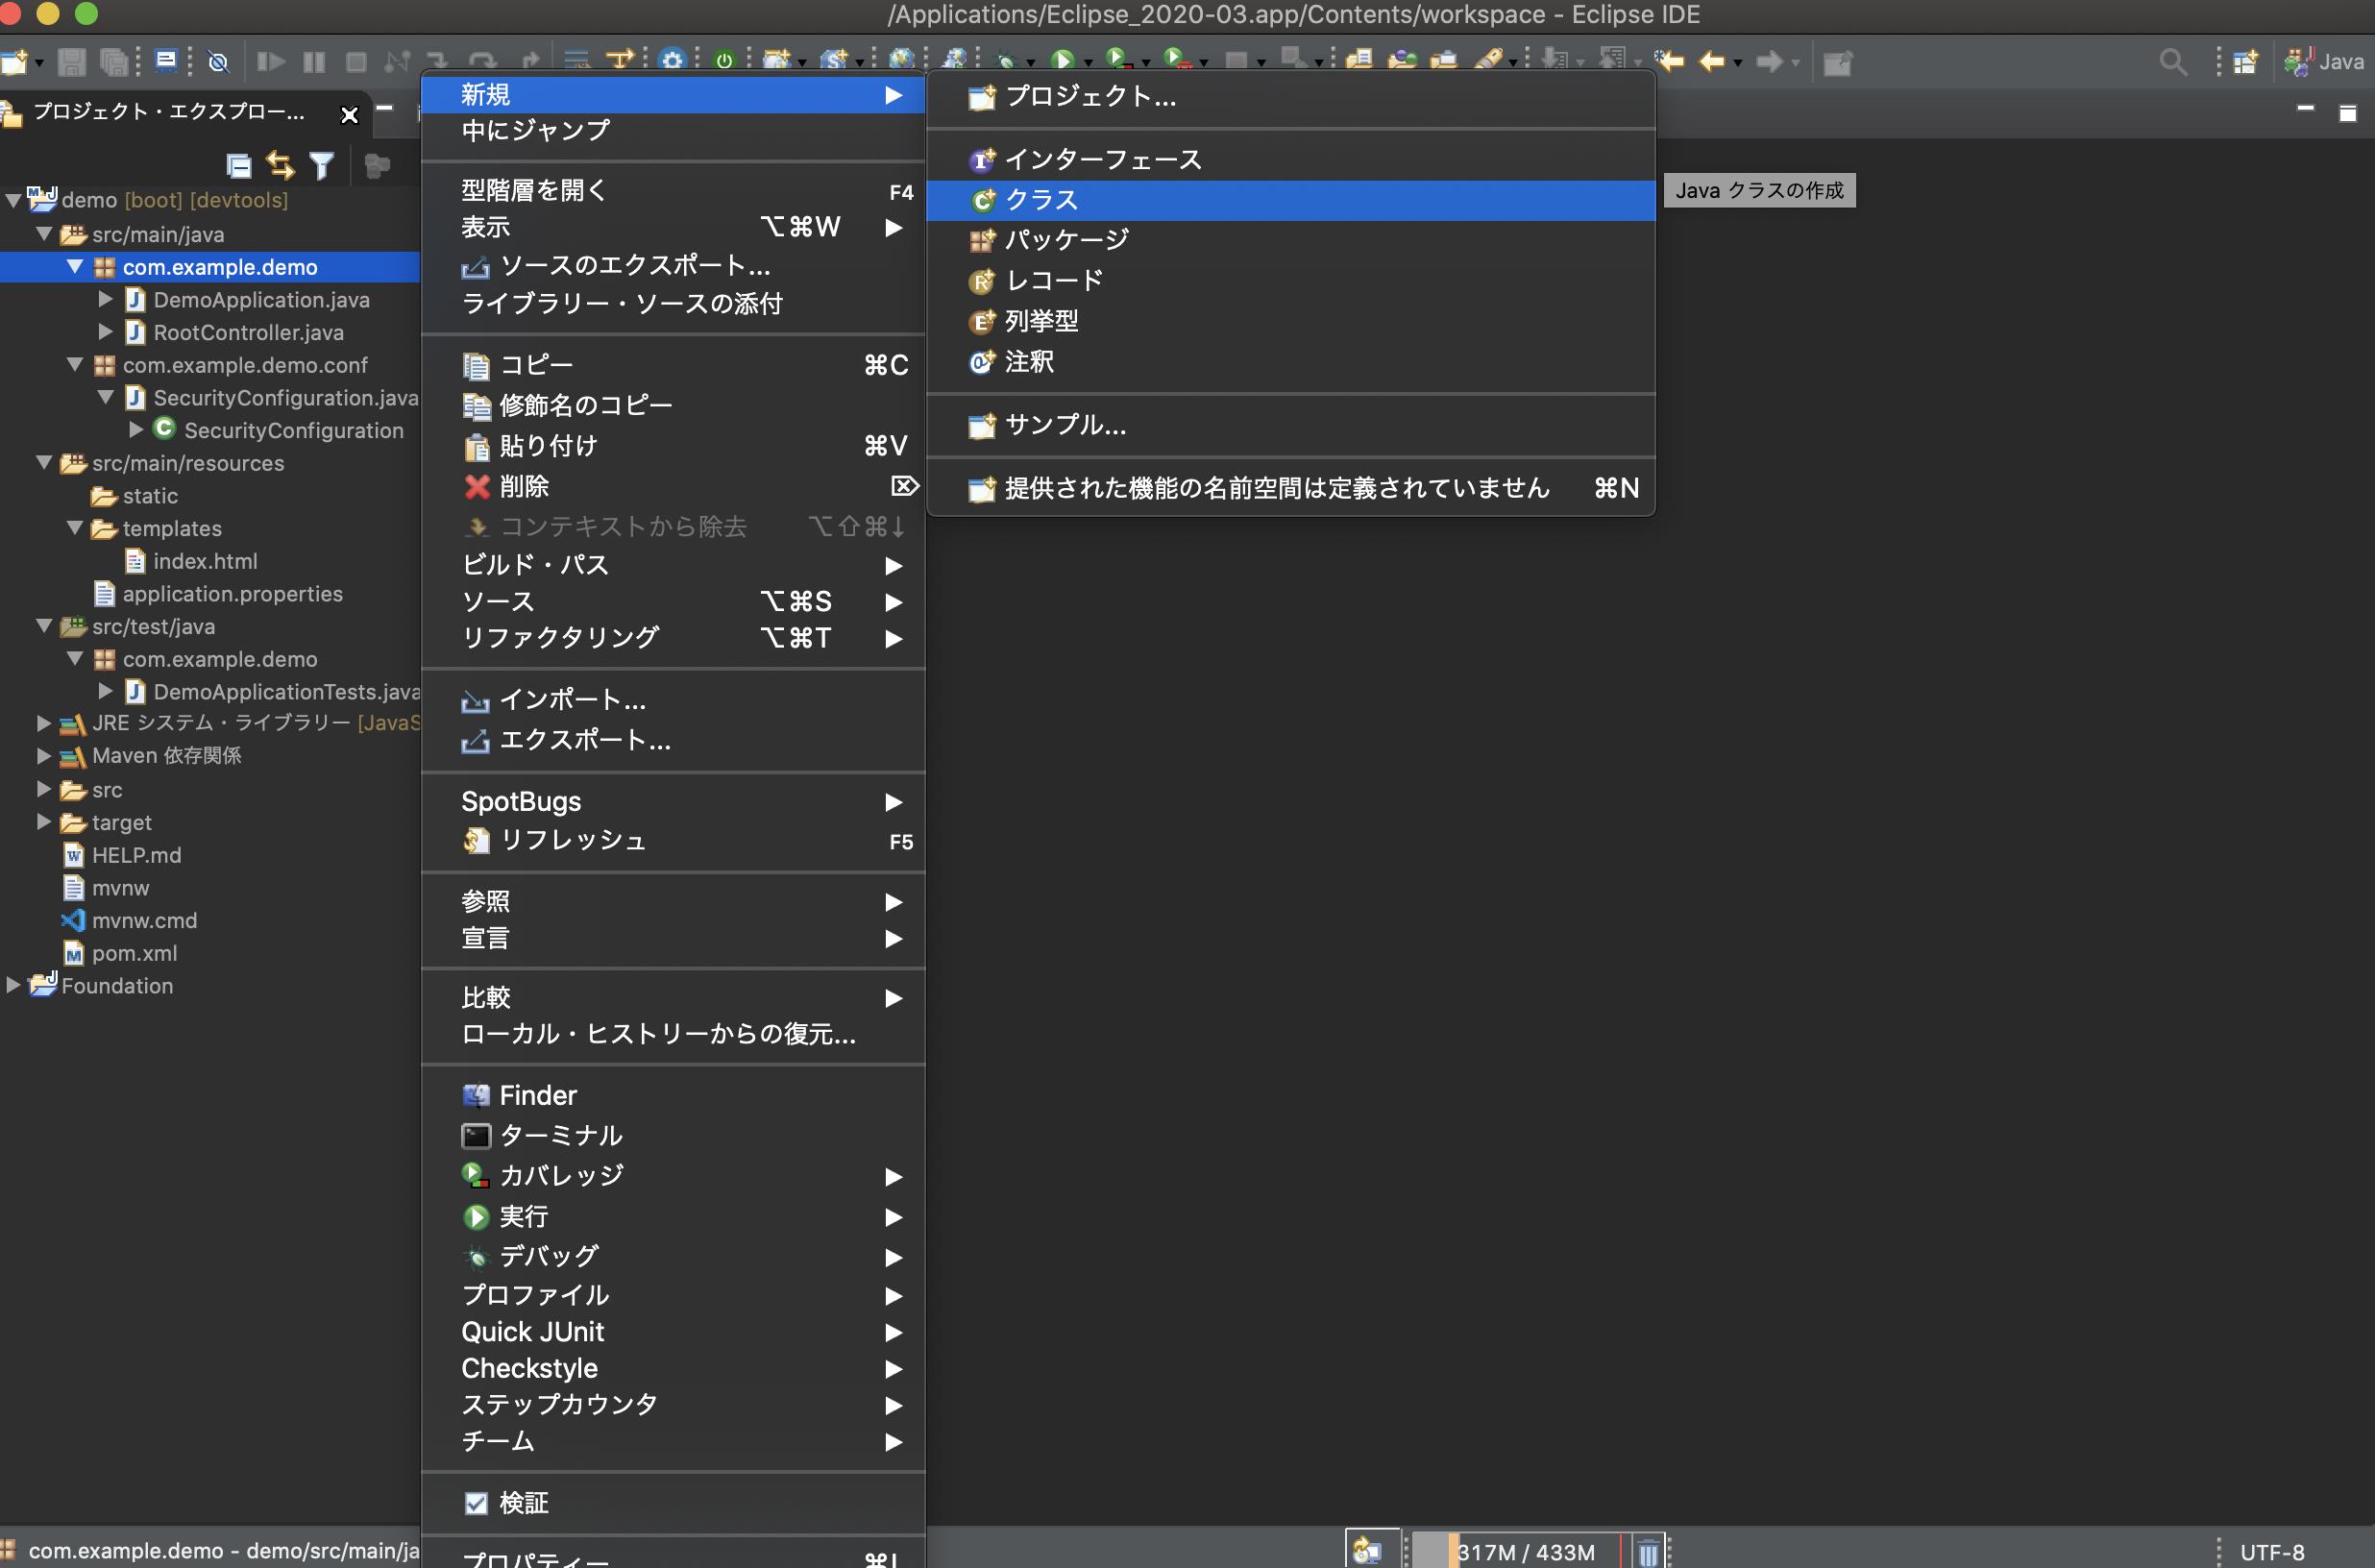 Screenshot 2020-07-20 8.45.47.png